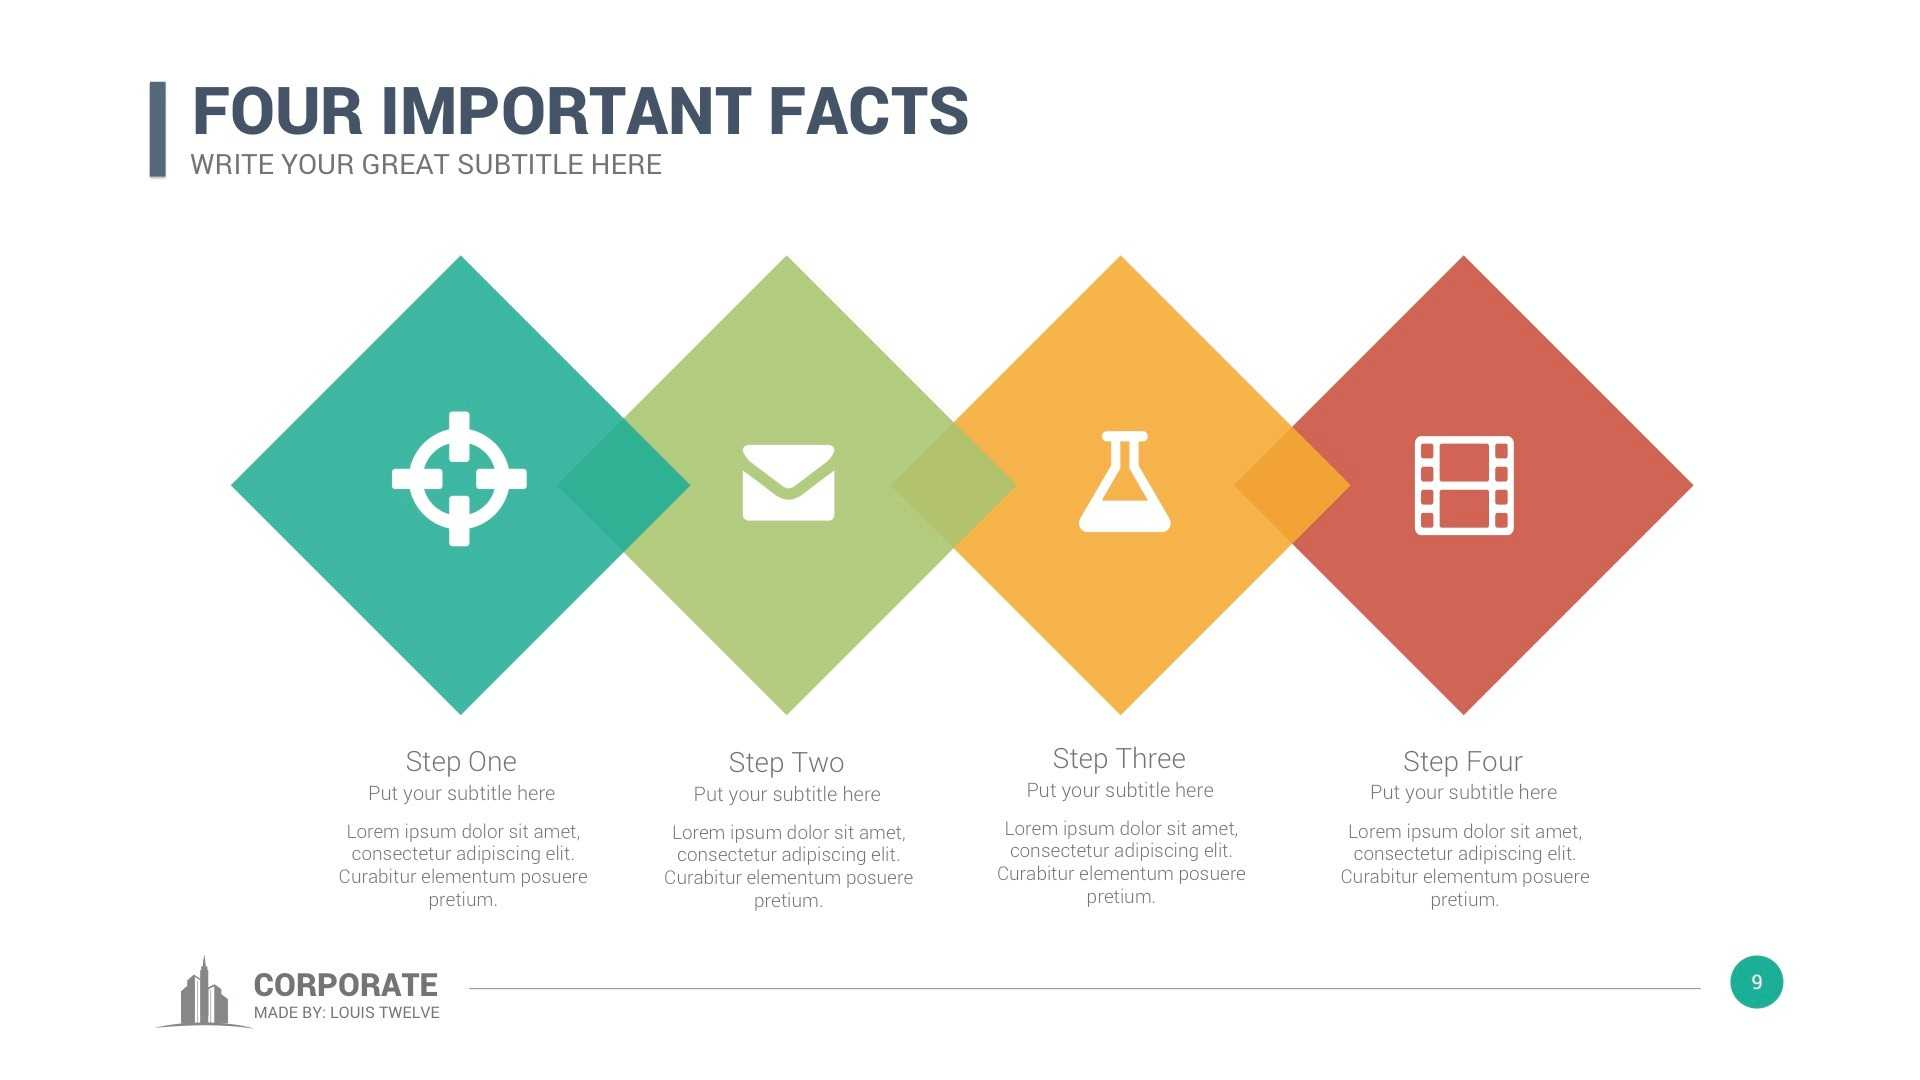 Corporate Overview Powerpoint Template Regarding Fancy Powerpoint Templates